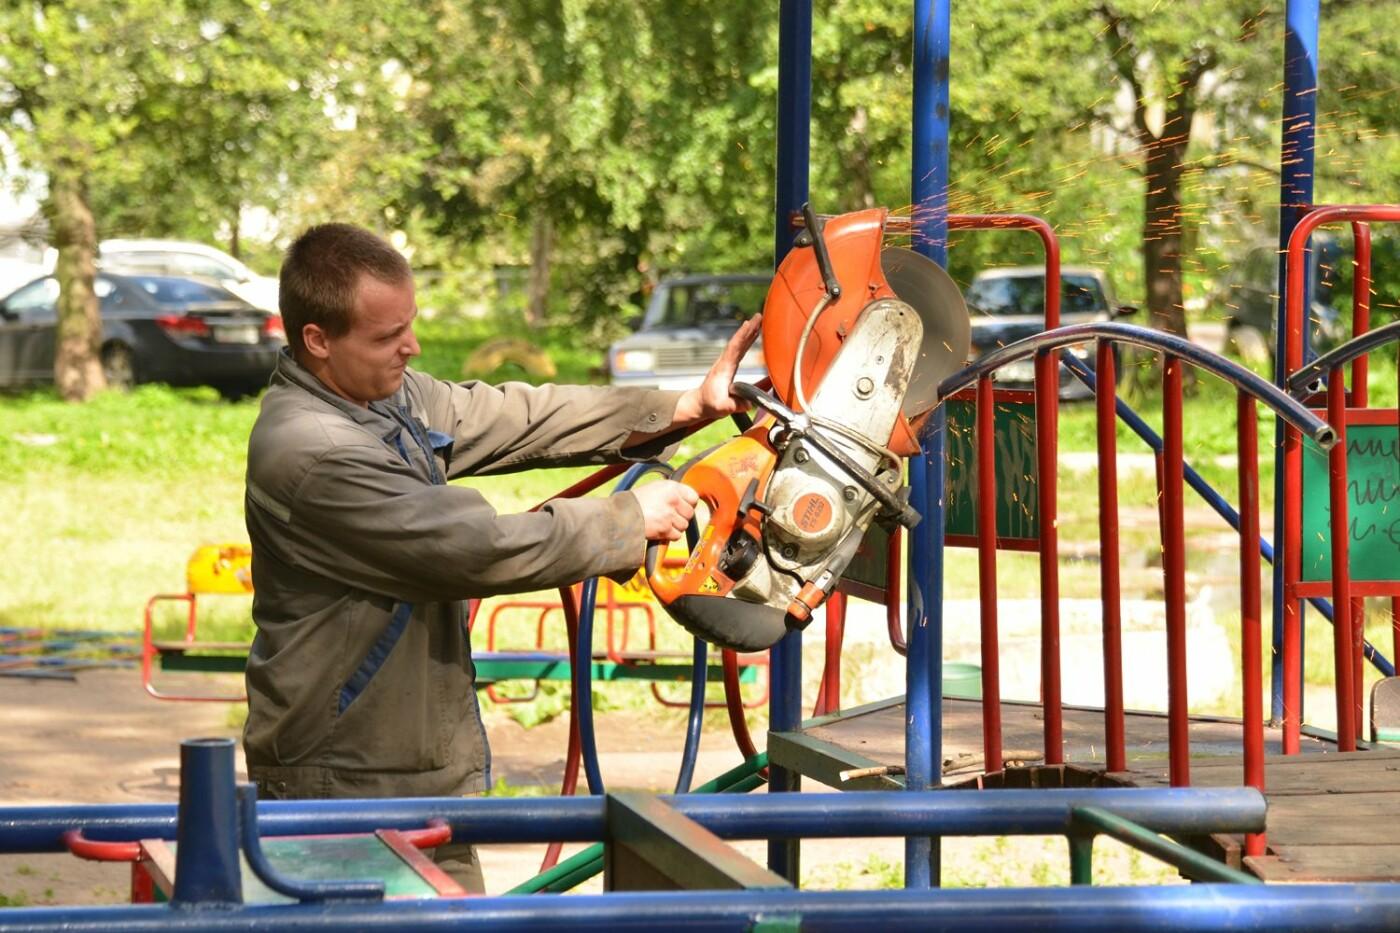 В Тамбове до 5 июня снесут детскую площадку под ЛЭП, фото-1